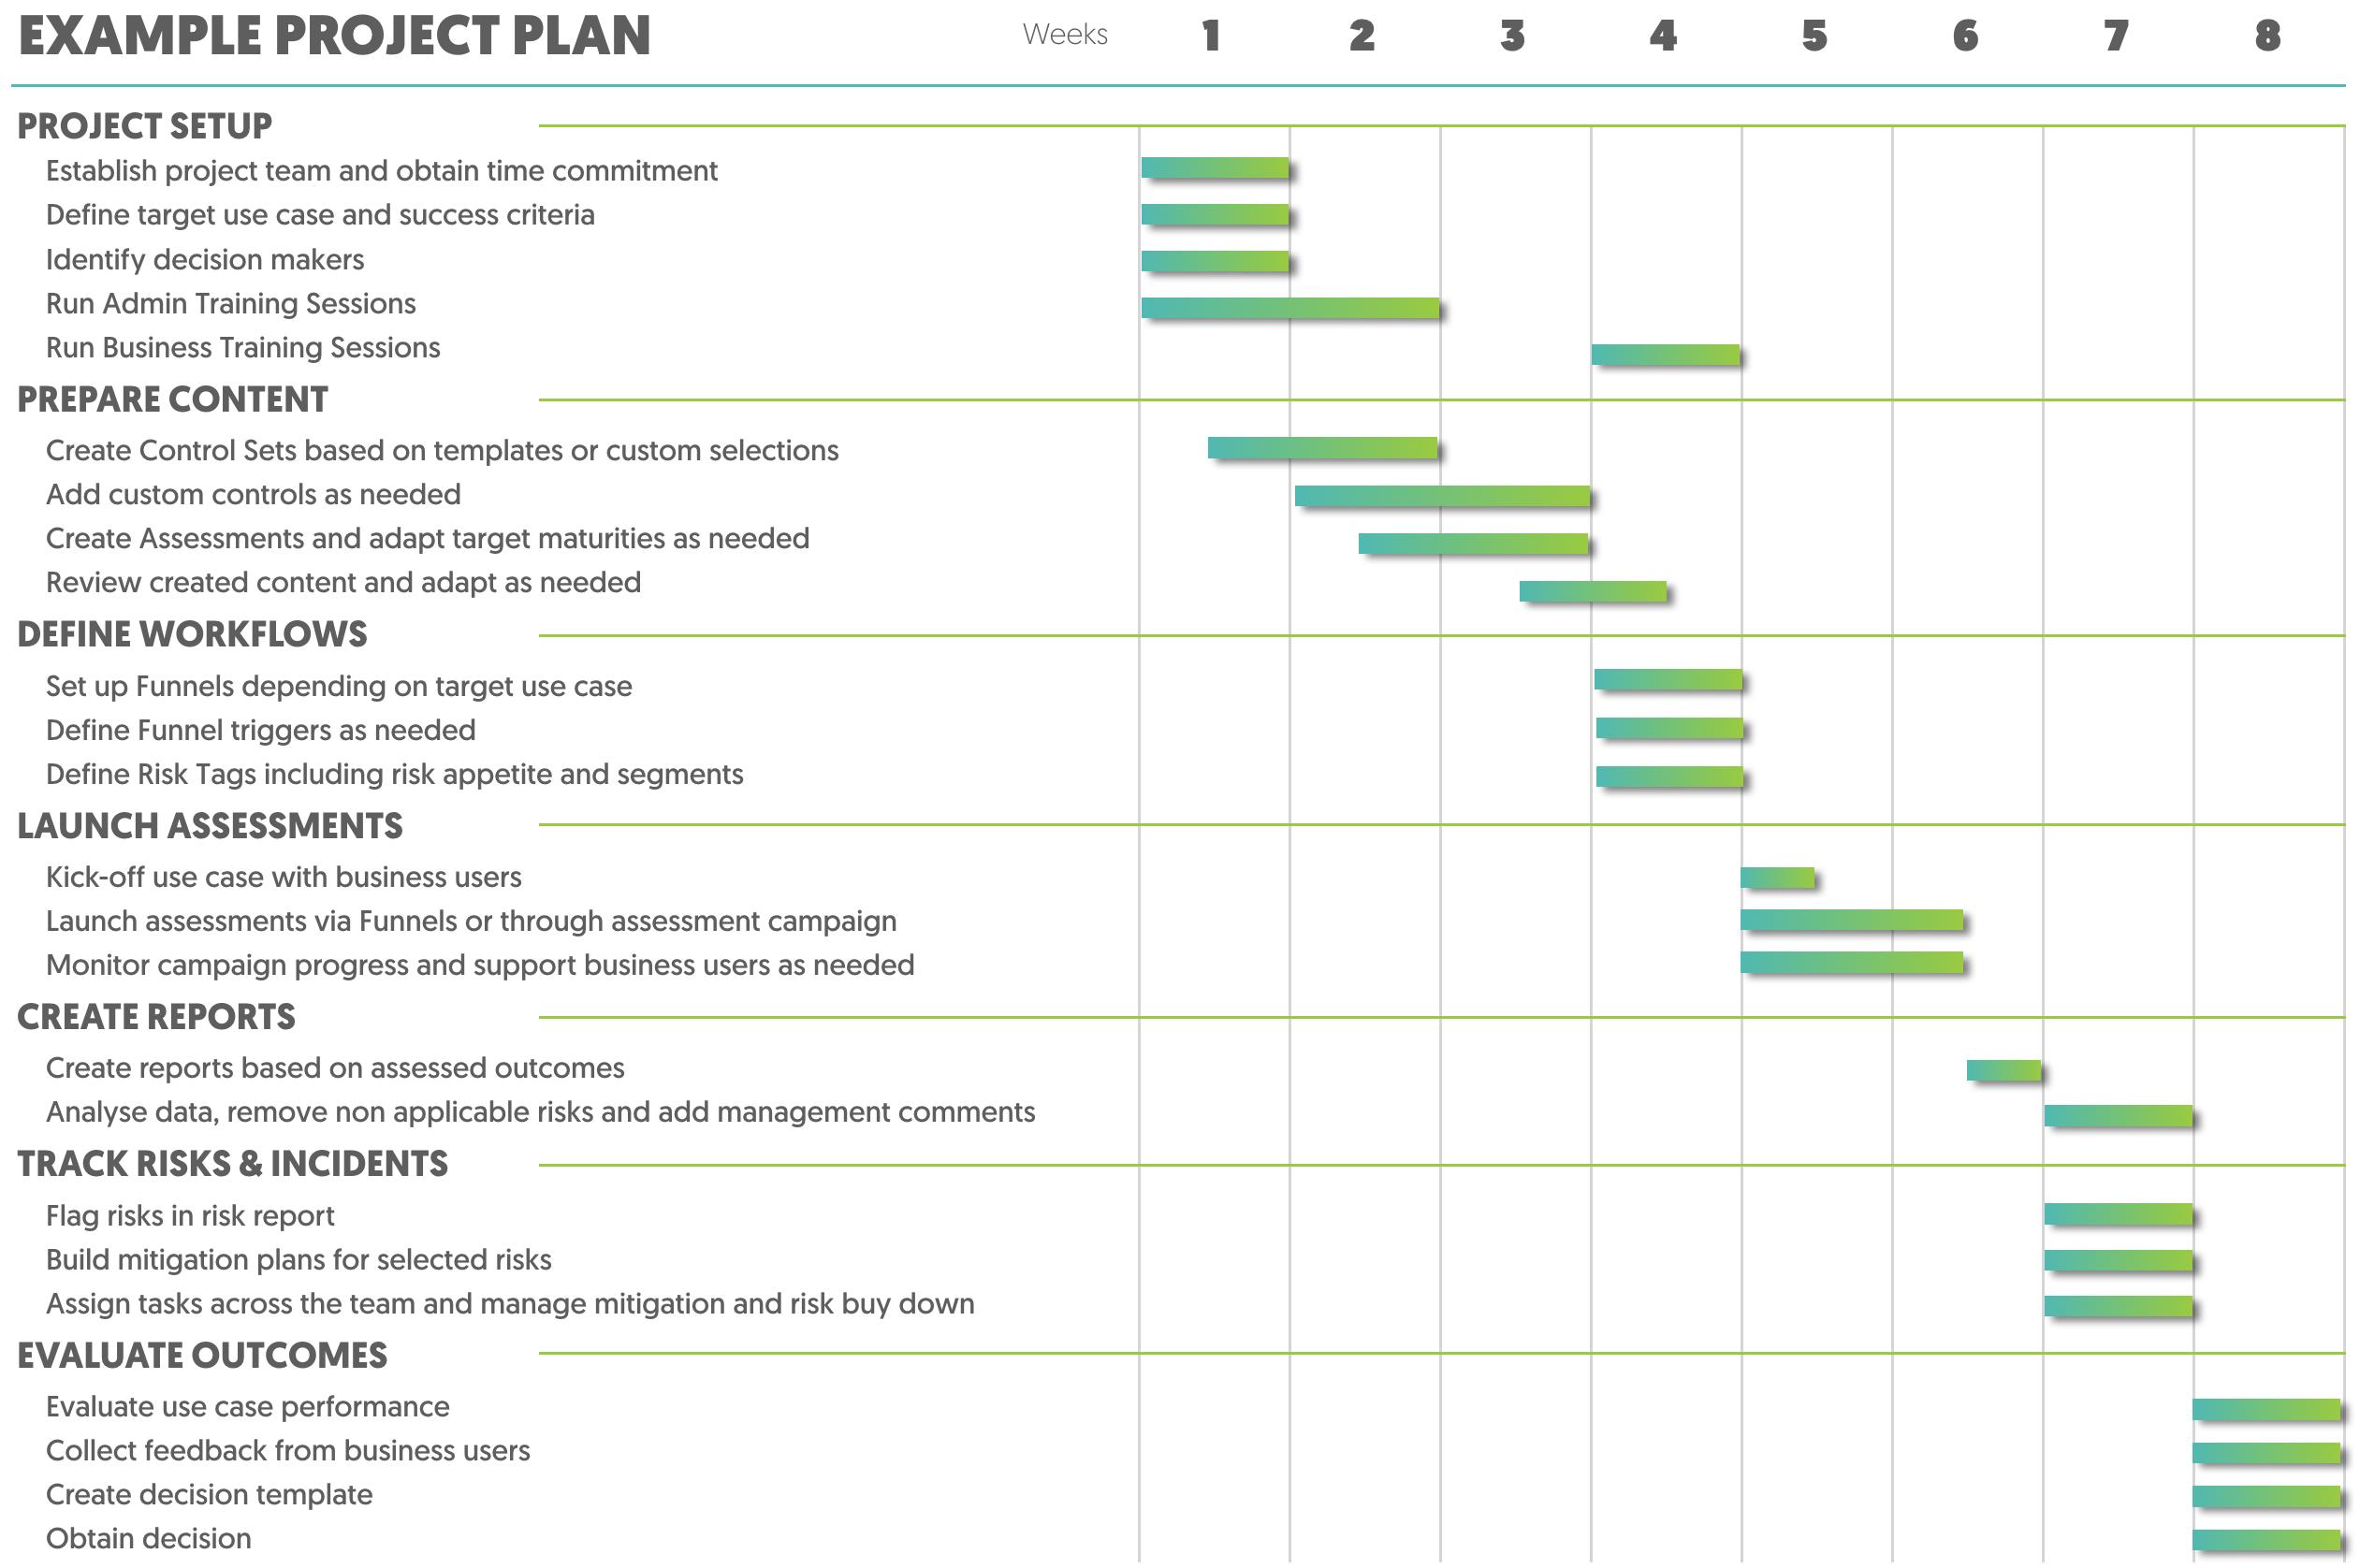 PoC Project Plan